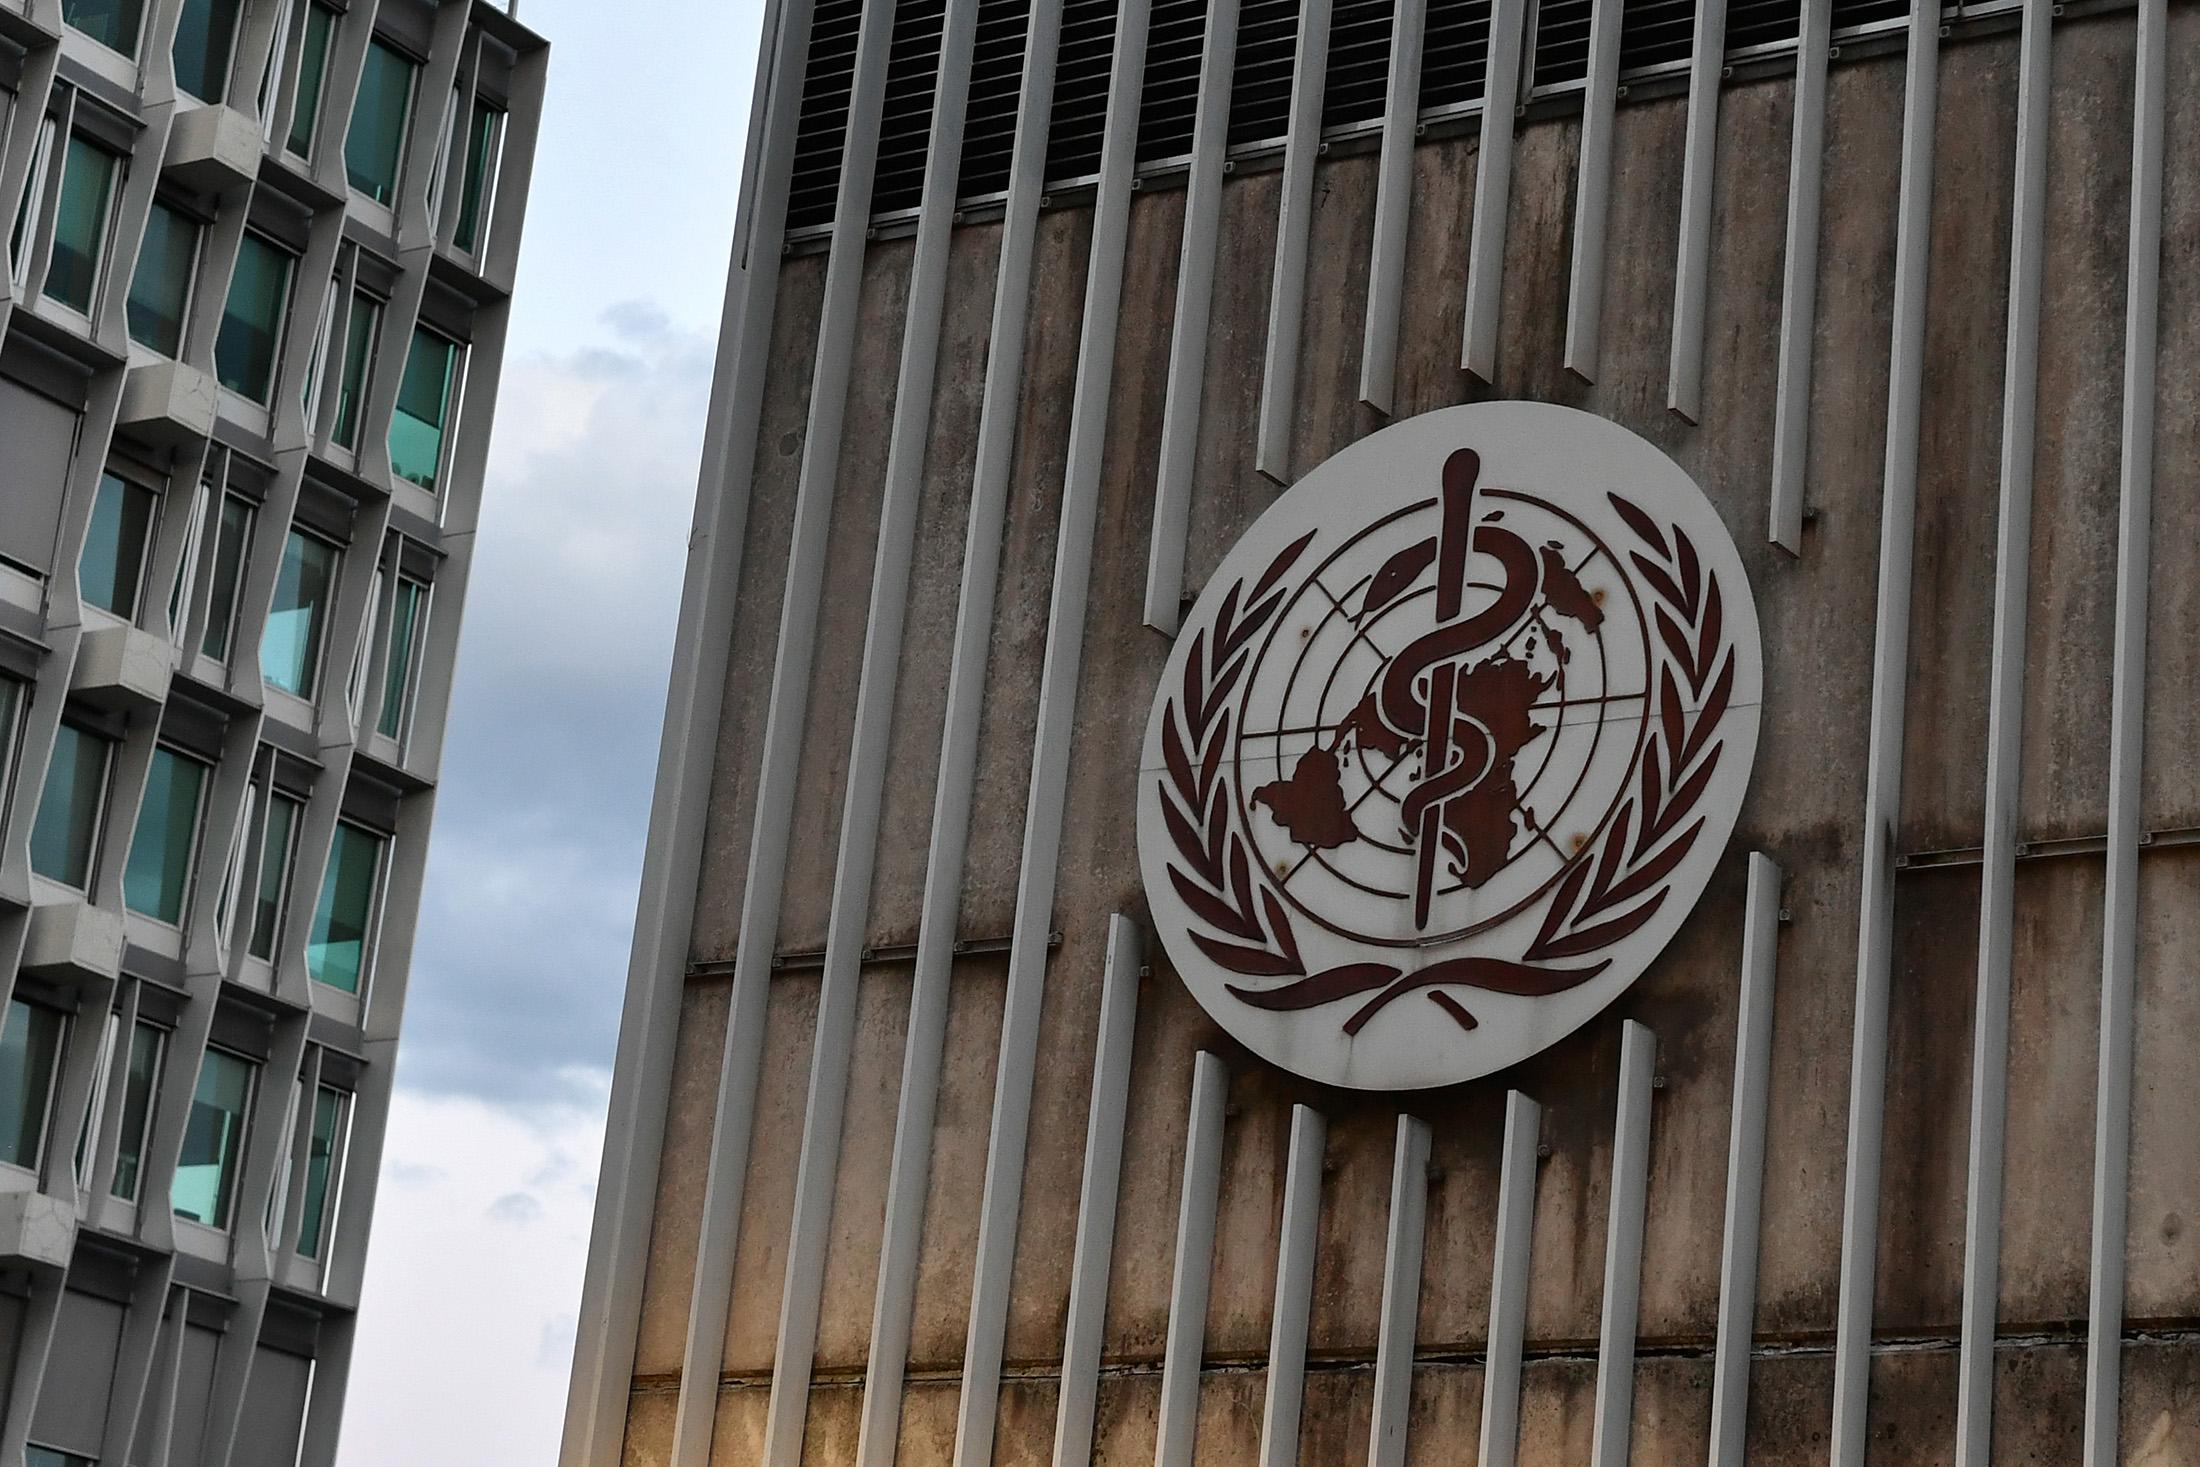 World Health Organization (WHO) headquarters in Geneva, Switzerland.